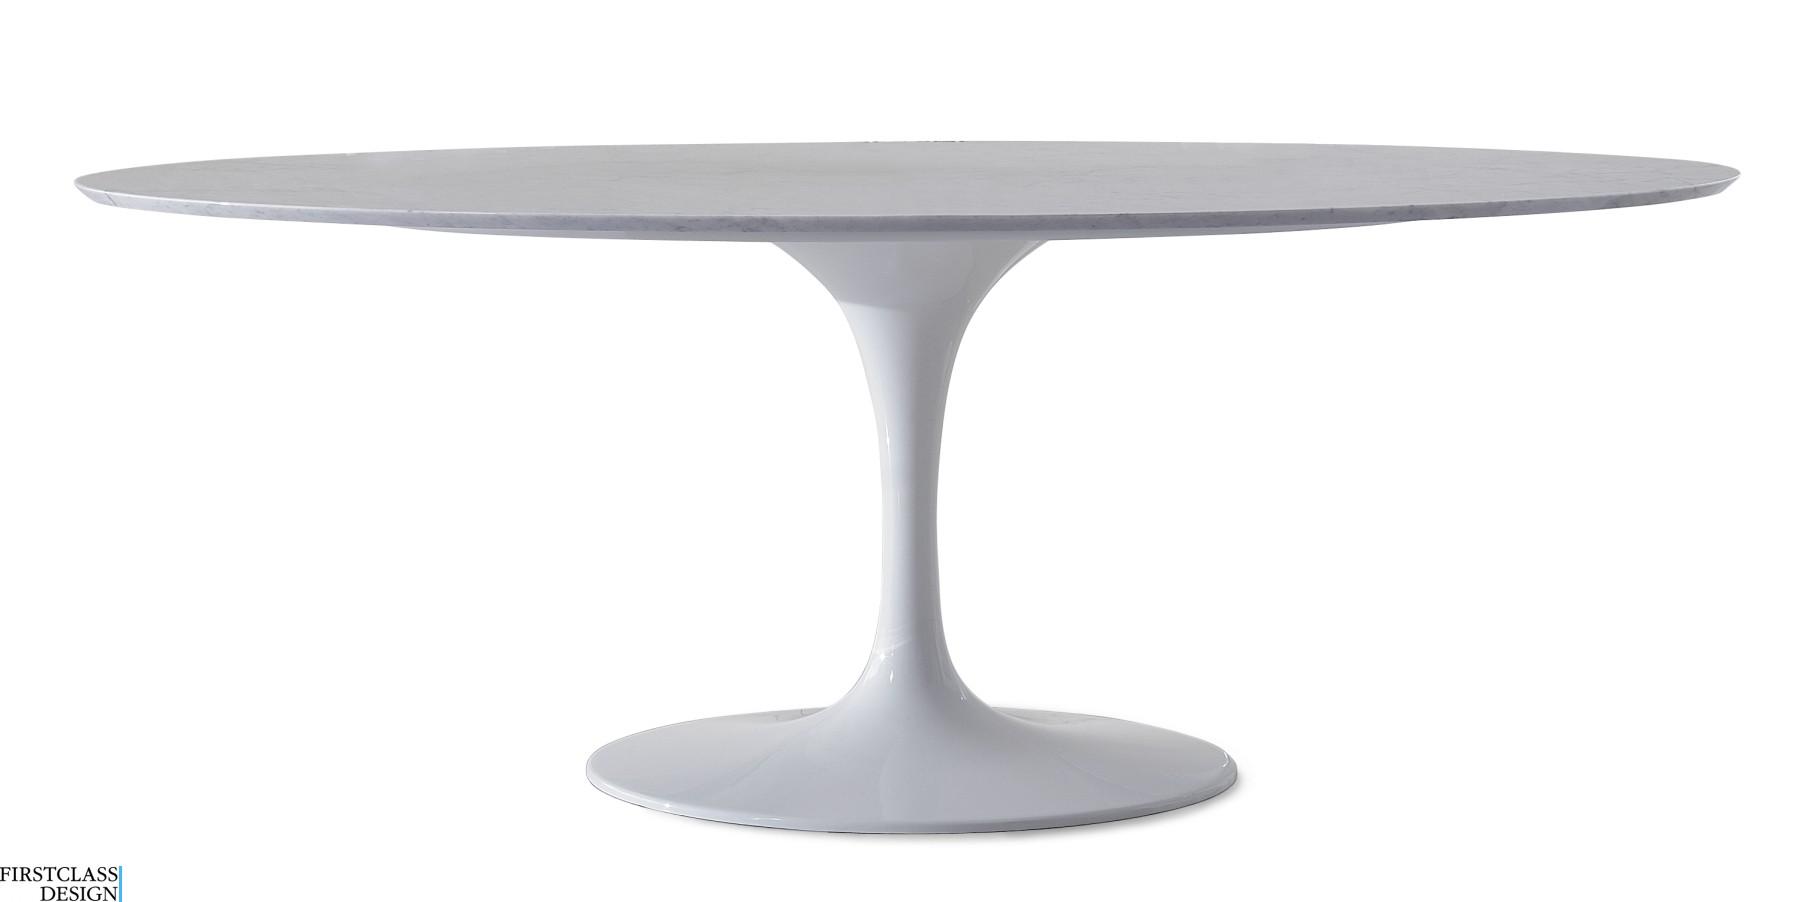 tulip table and chairs nz chair covers wholesale new home arreda molfetta arredamento casa mobili letti